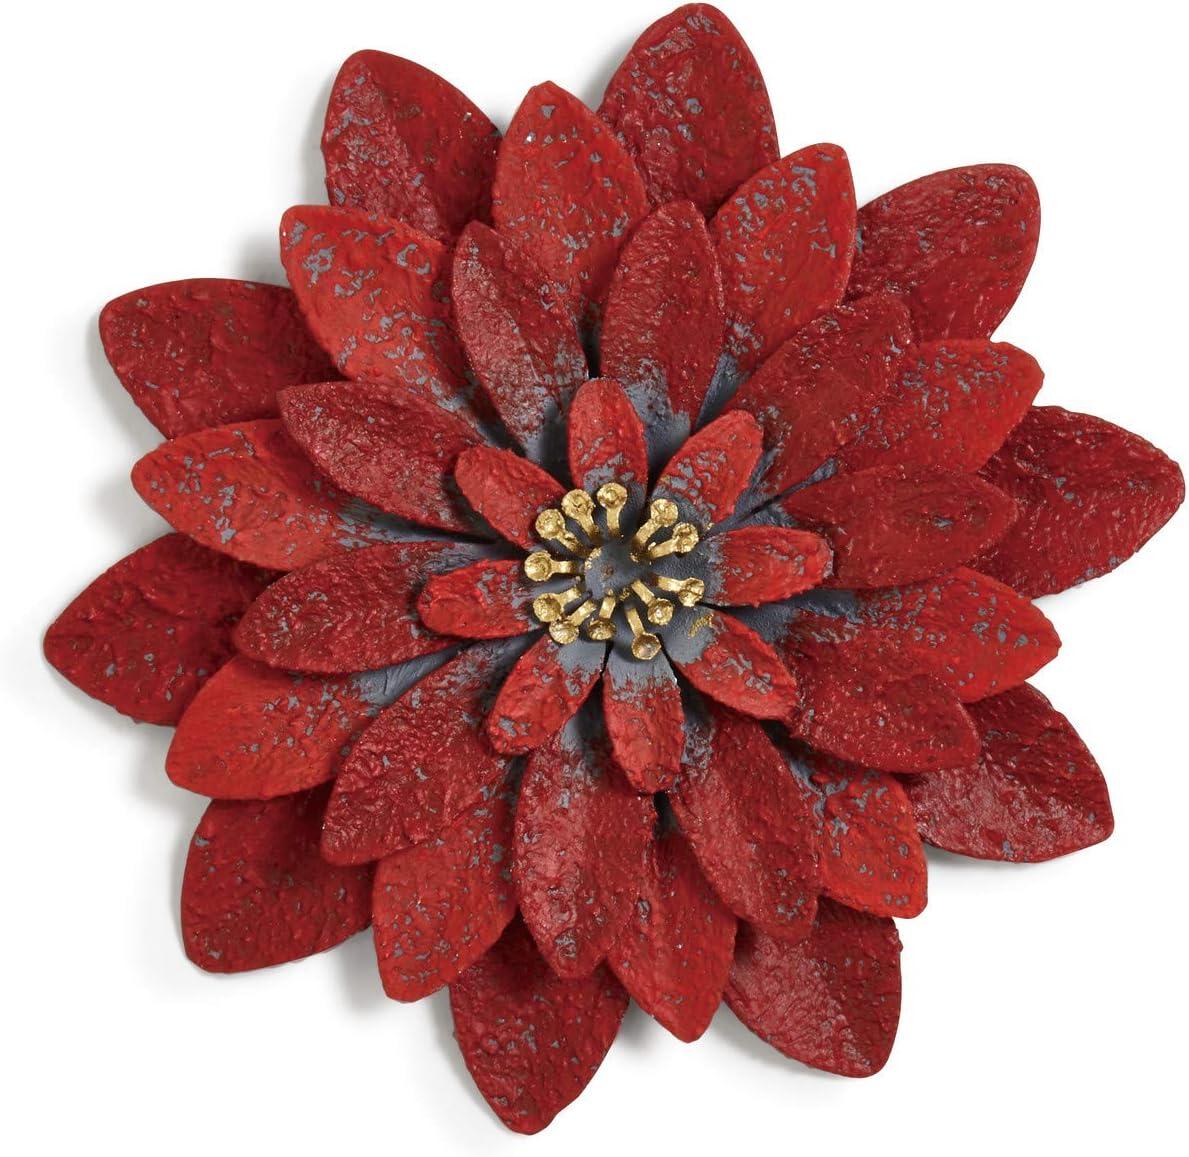 DEMDACO Poinsettia Floral Red 4 x 4 Metal Refrigerator Magnet Token